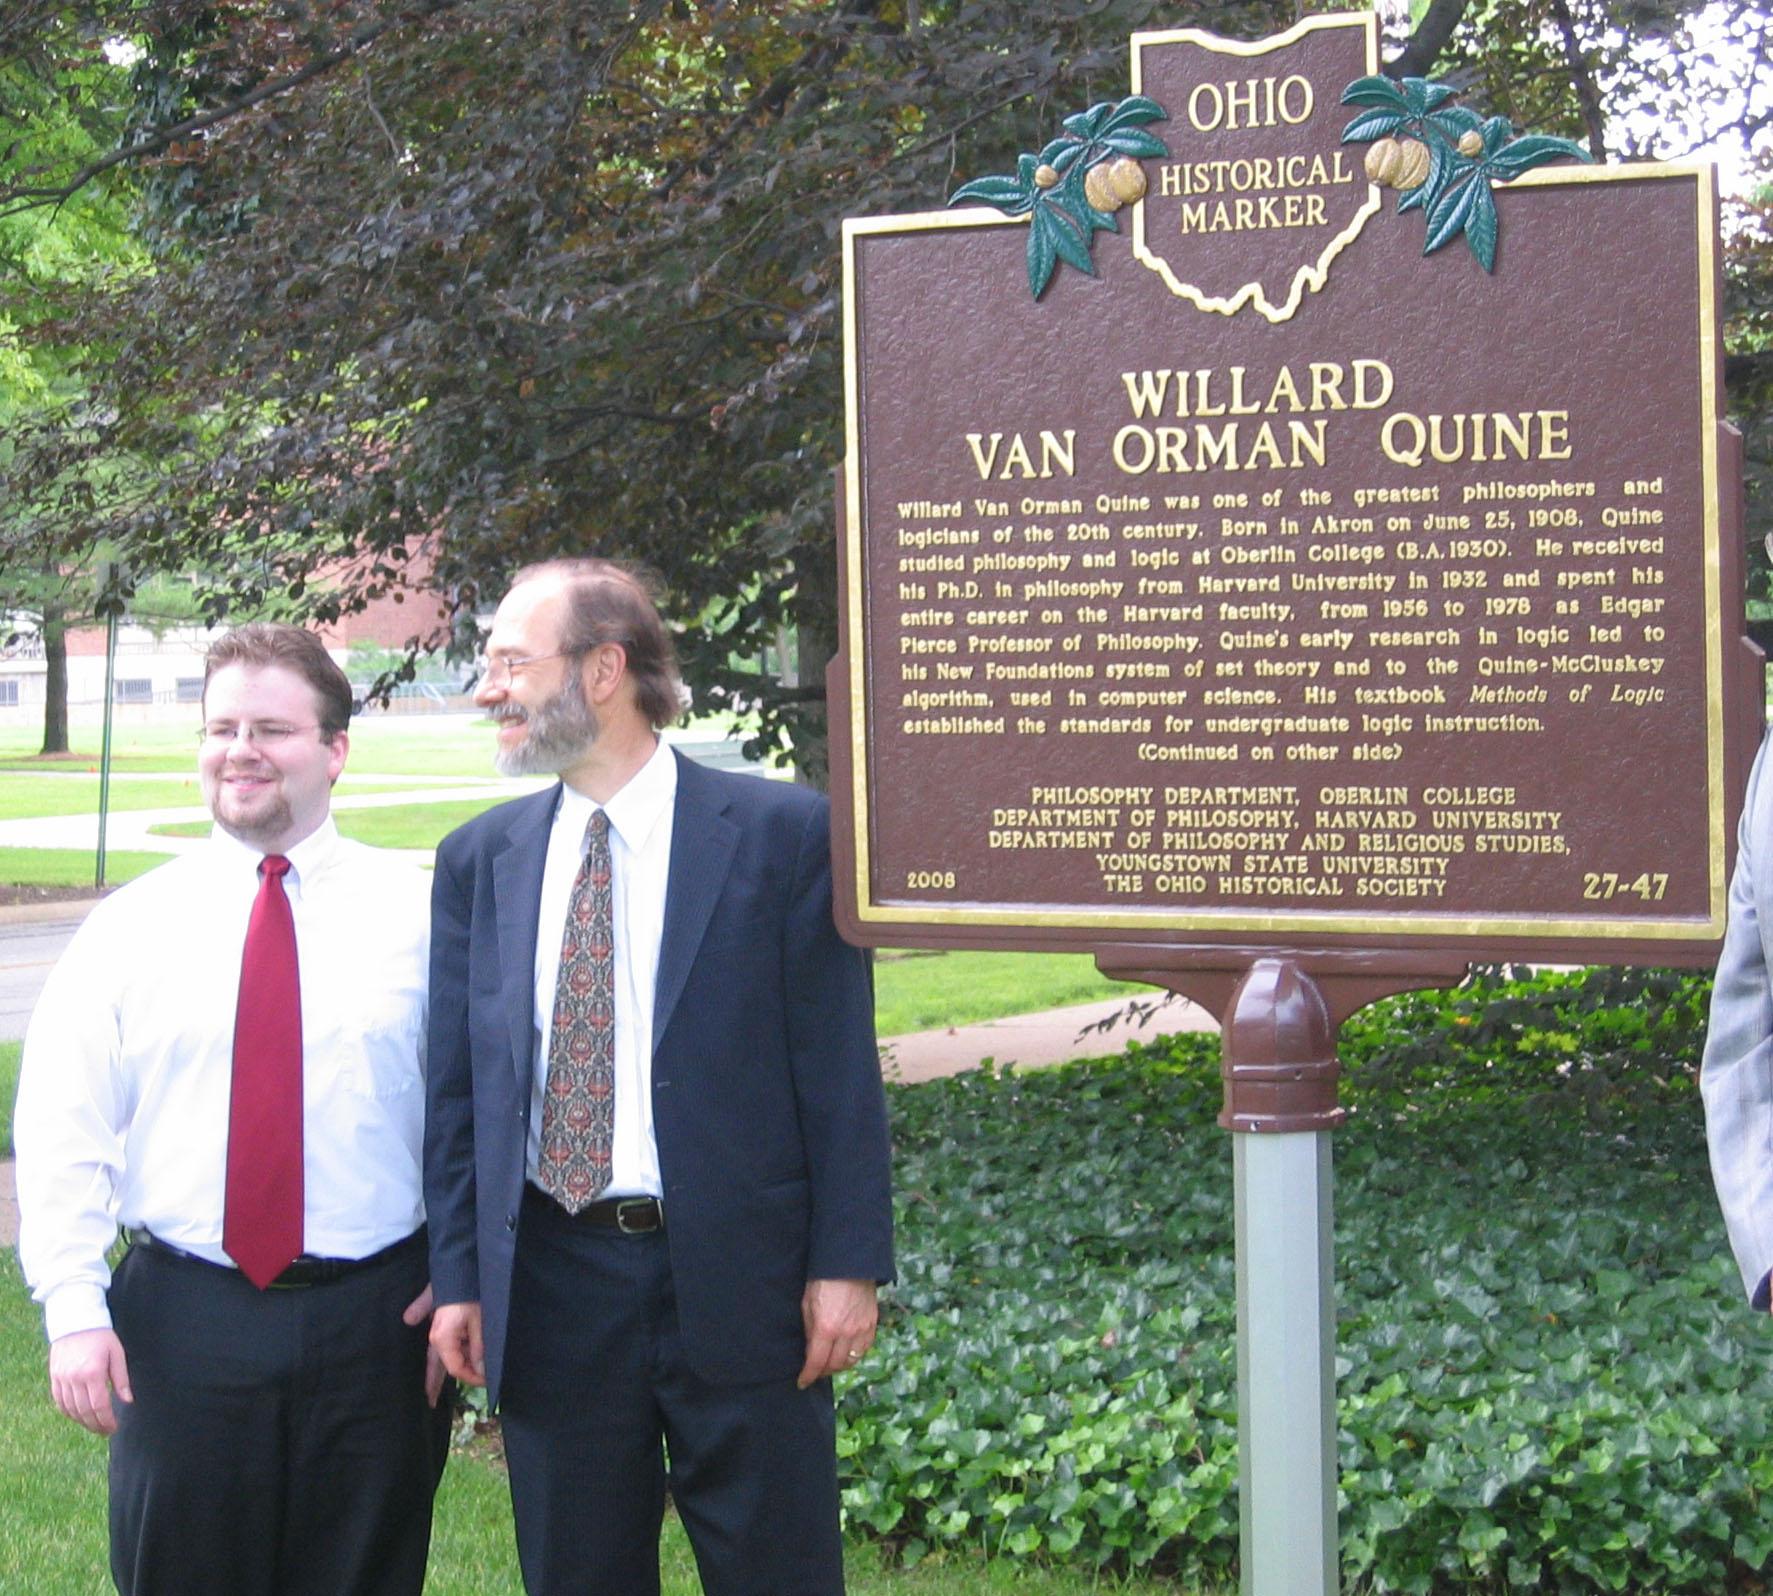 Willard Van Orman Quine Home Page By Douglas Boynton Short Circuit Tshirts Zazzle W V Marker